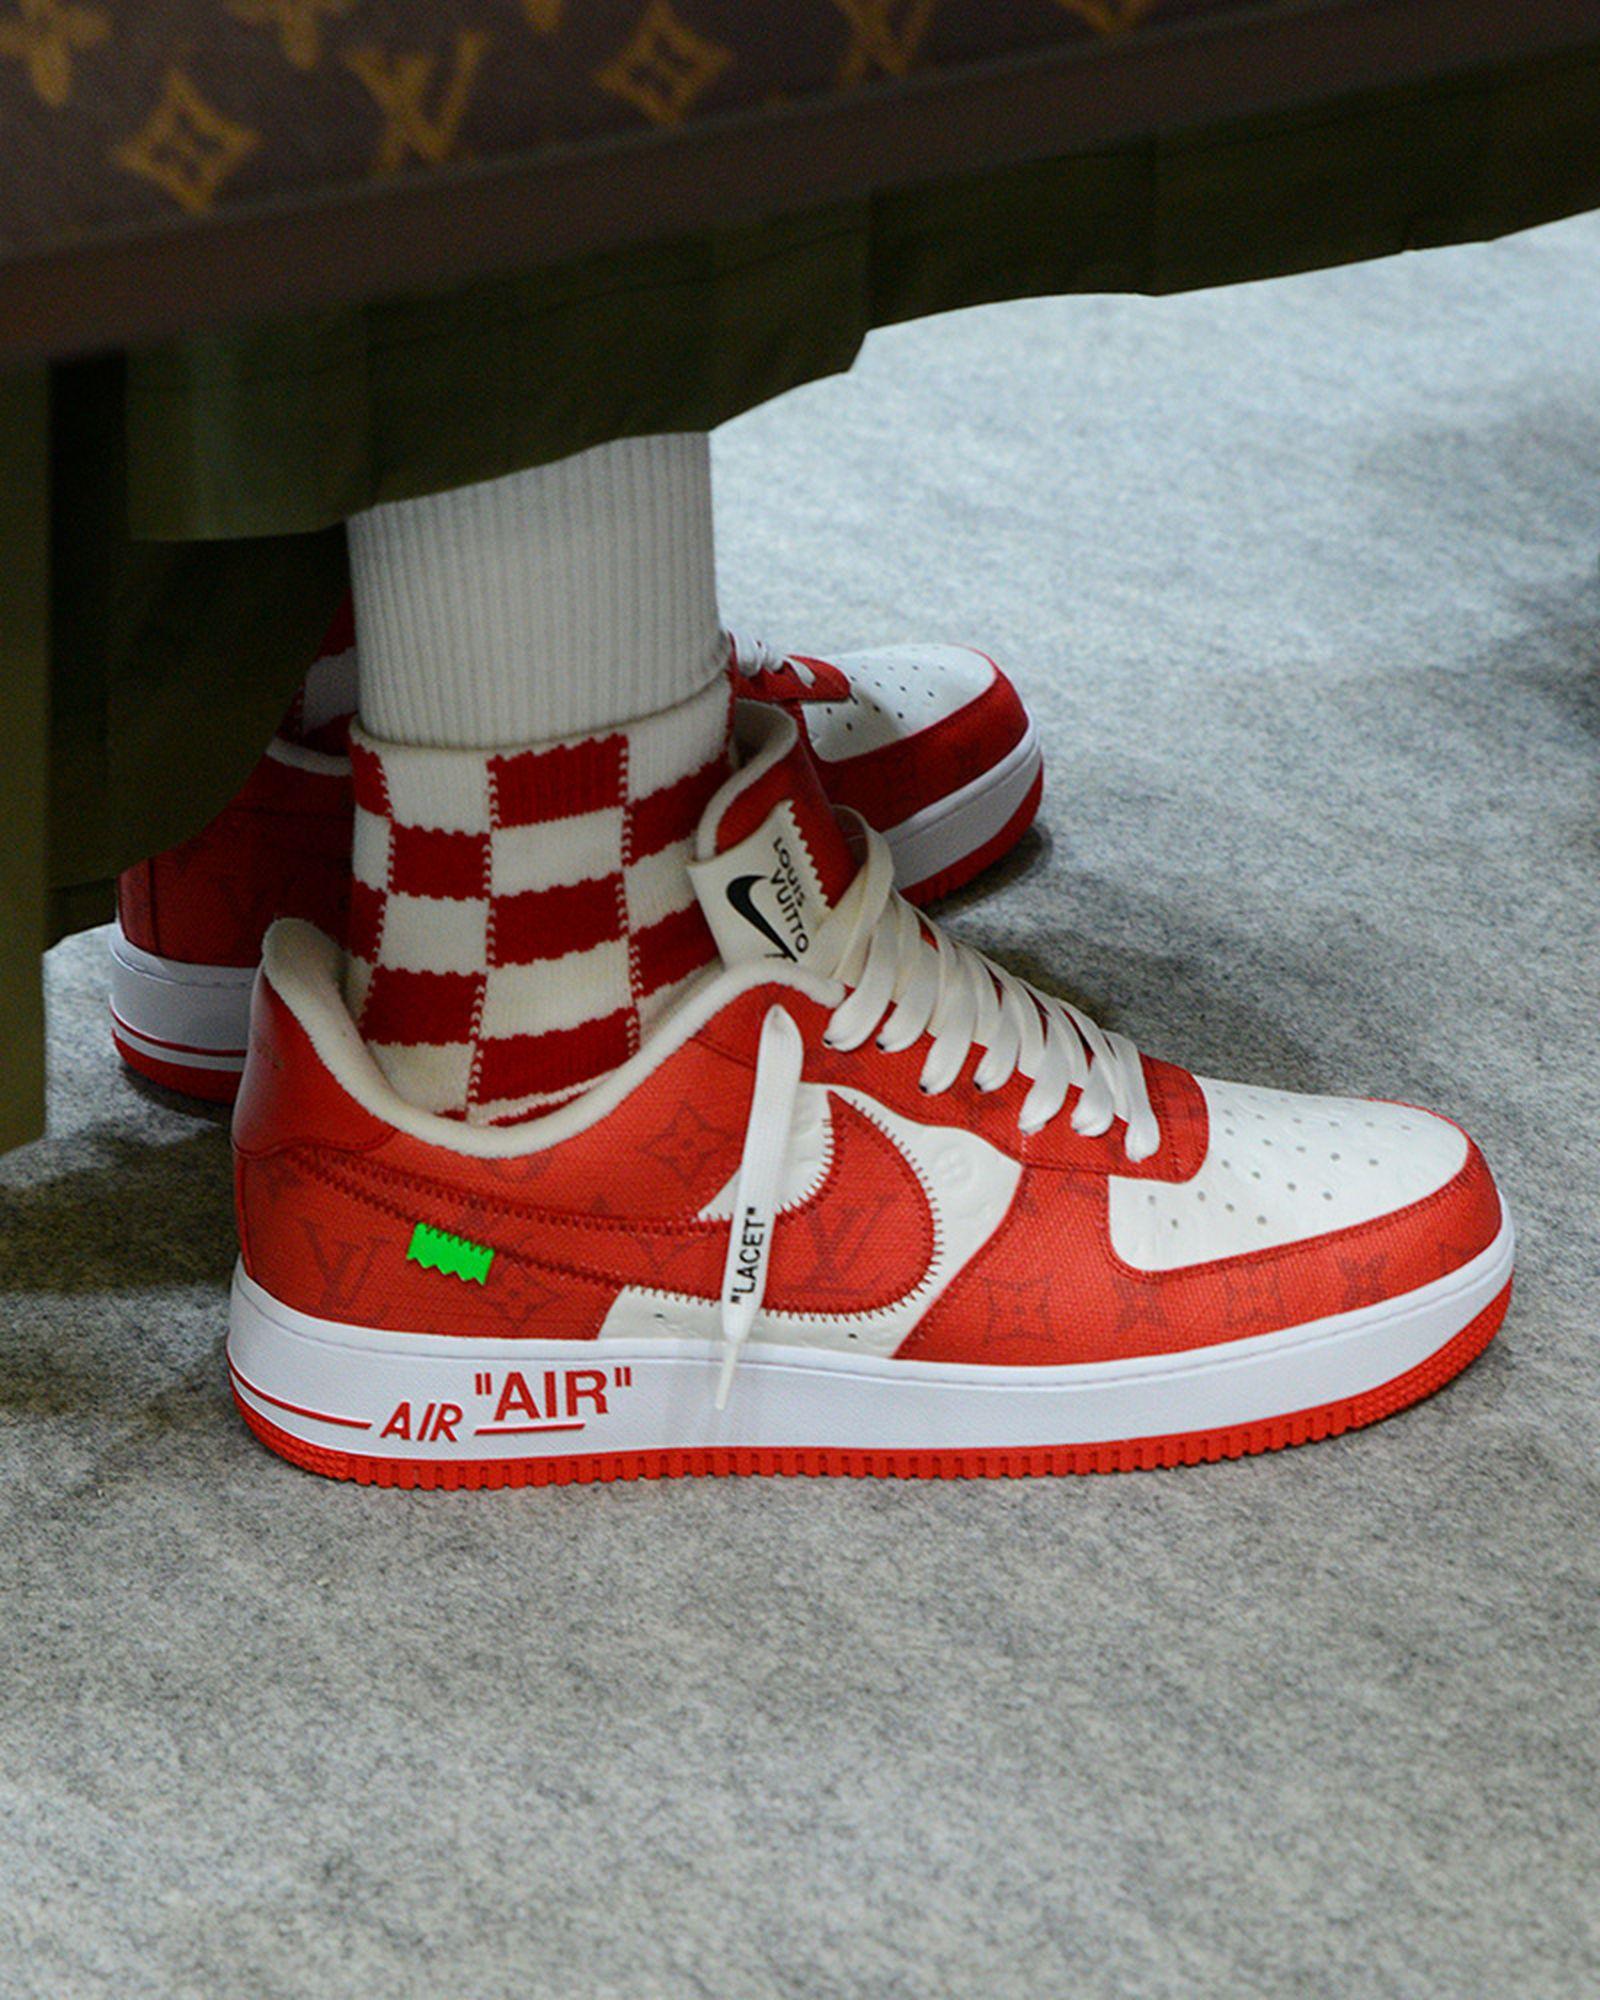 louis-vuitton-nike-virgil-abloh-sneaker-reveal-15